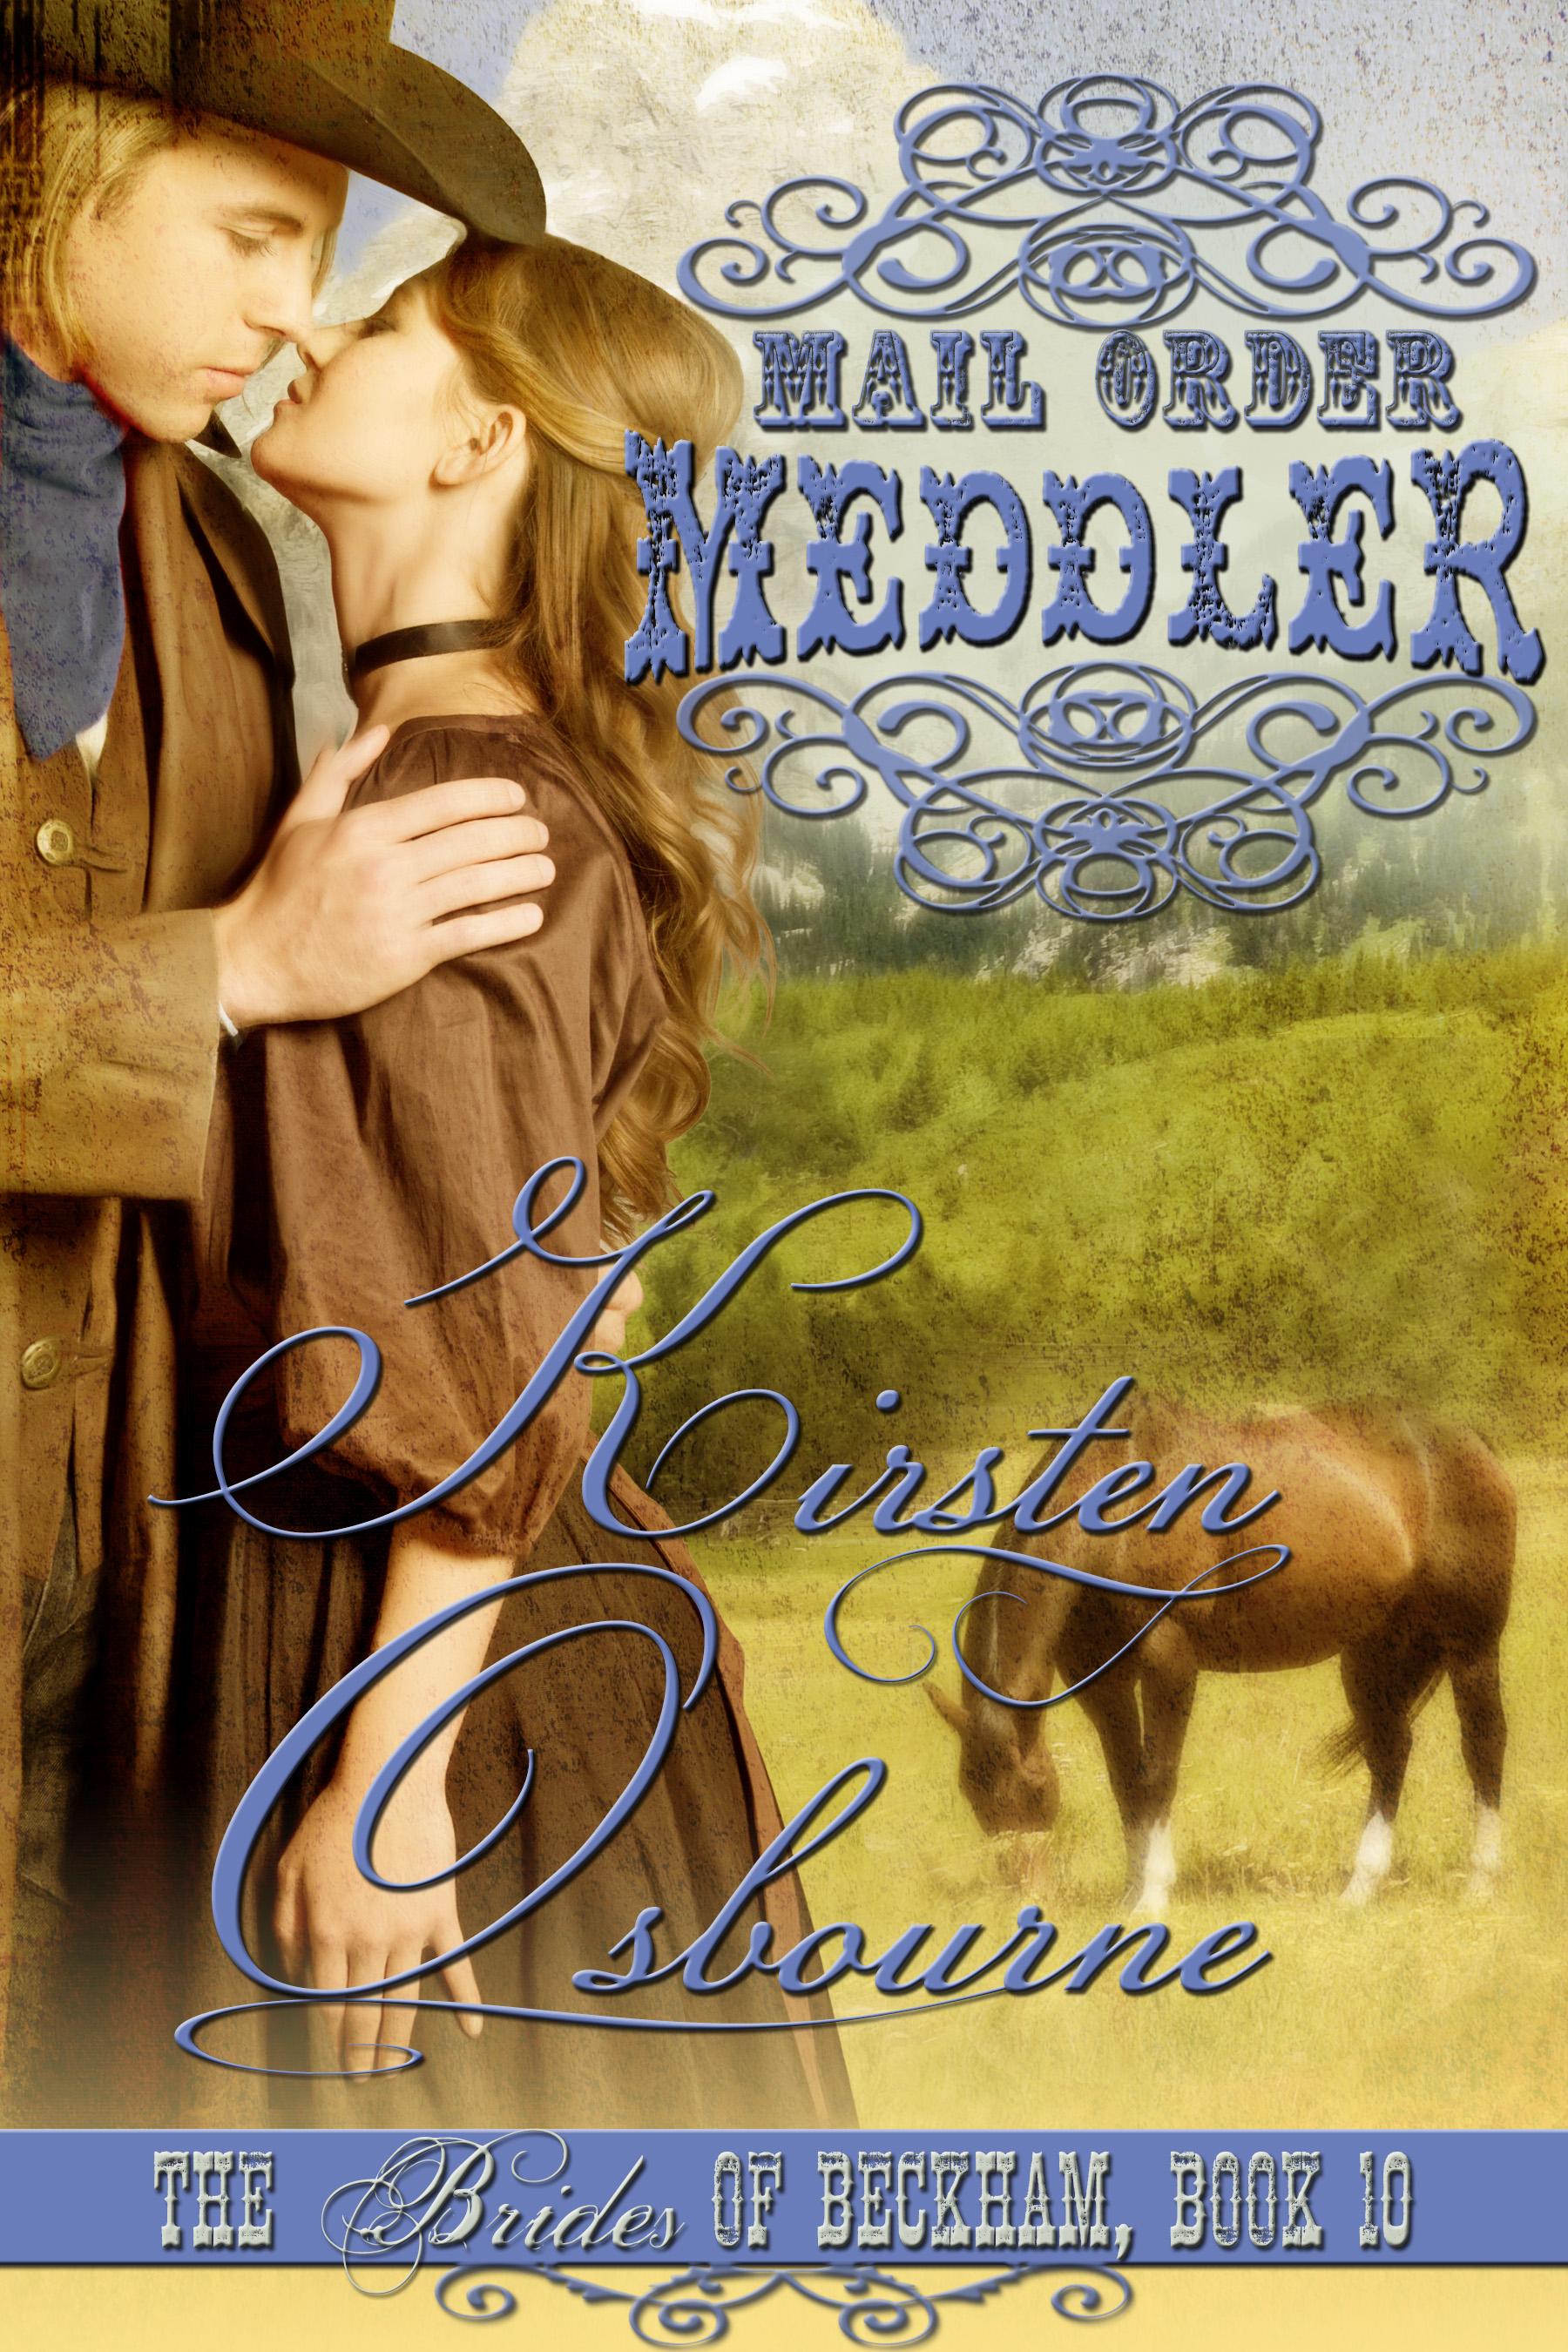 Kirsten Osbourne - Mail Order Meddler